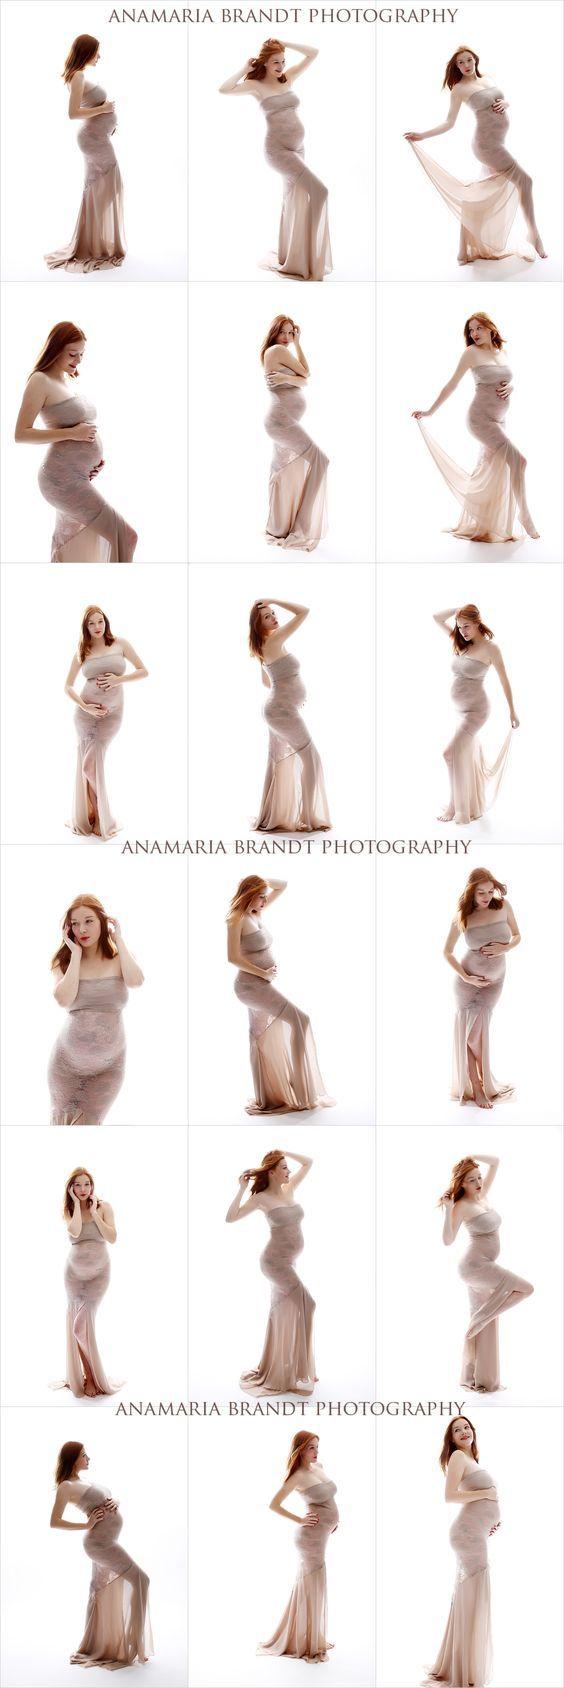 bump photography ideas - Google-Suche